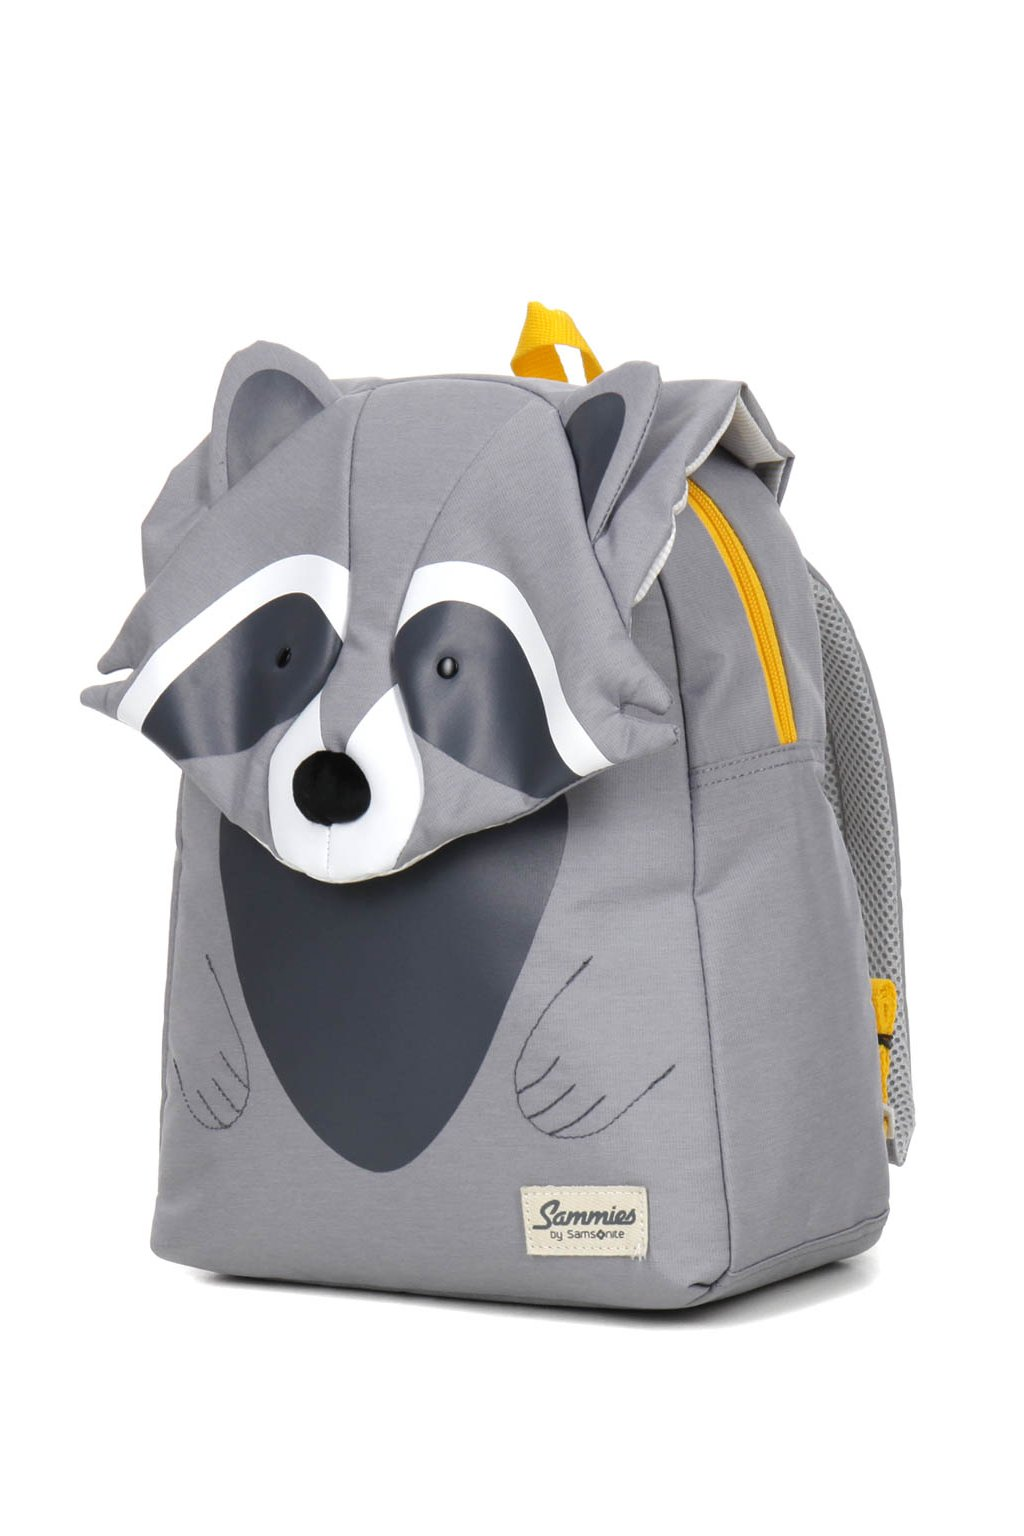 kufrland samsonite happysammieseco backpacks raccoonremy (8)